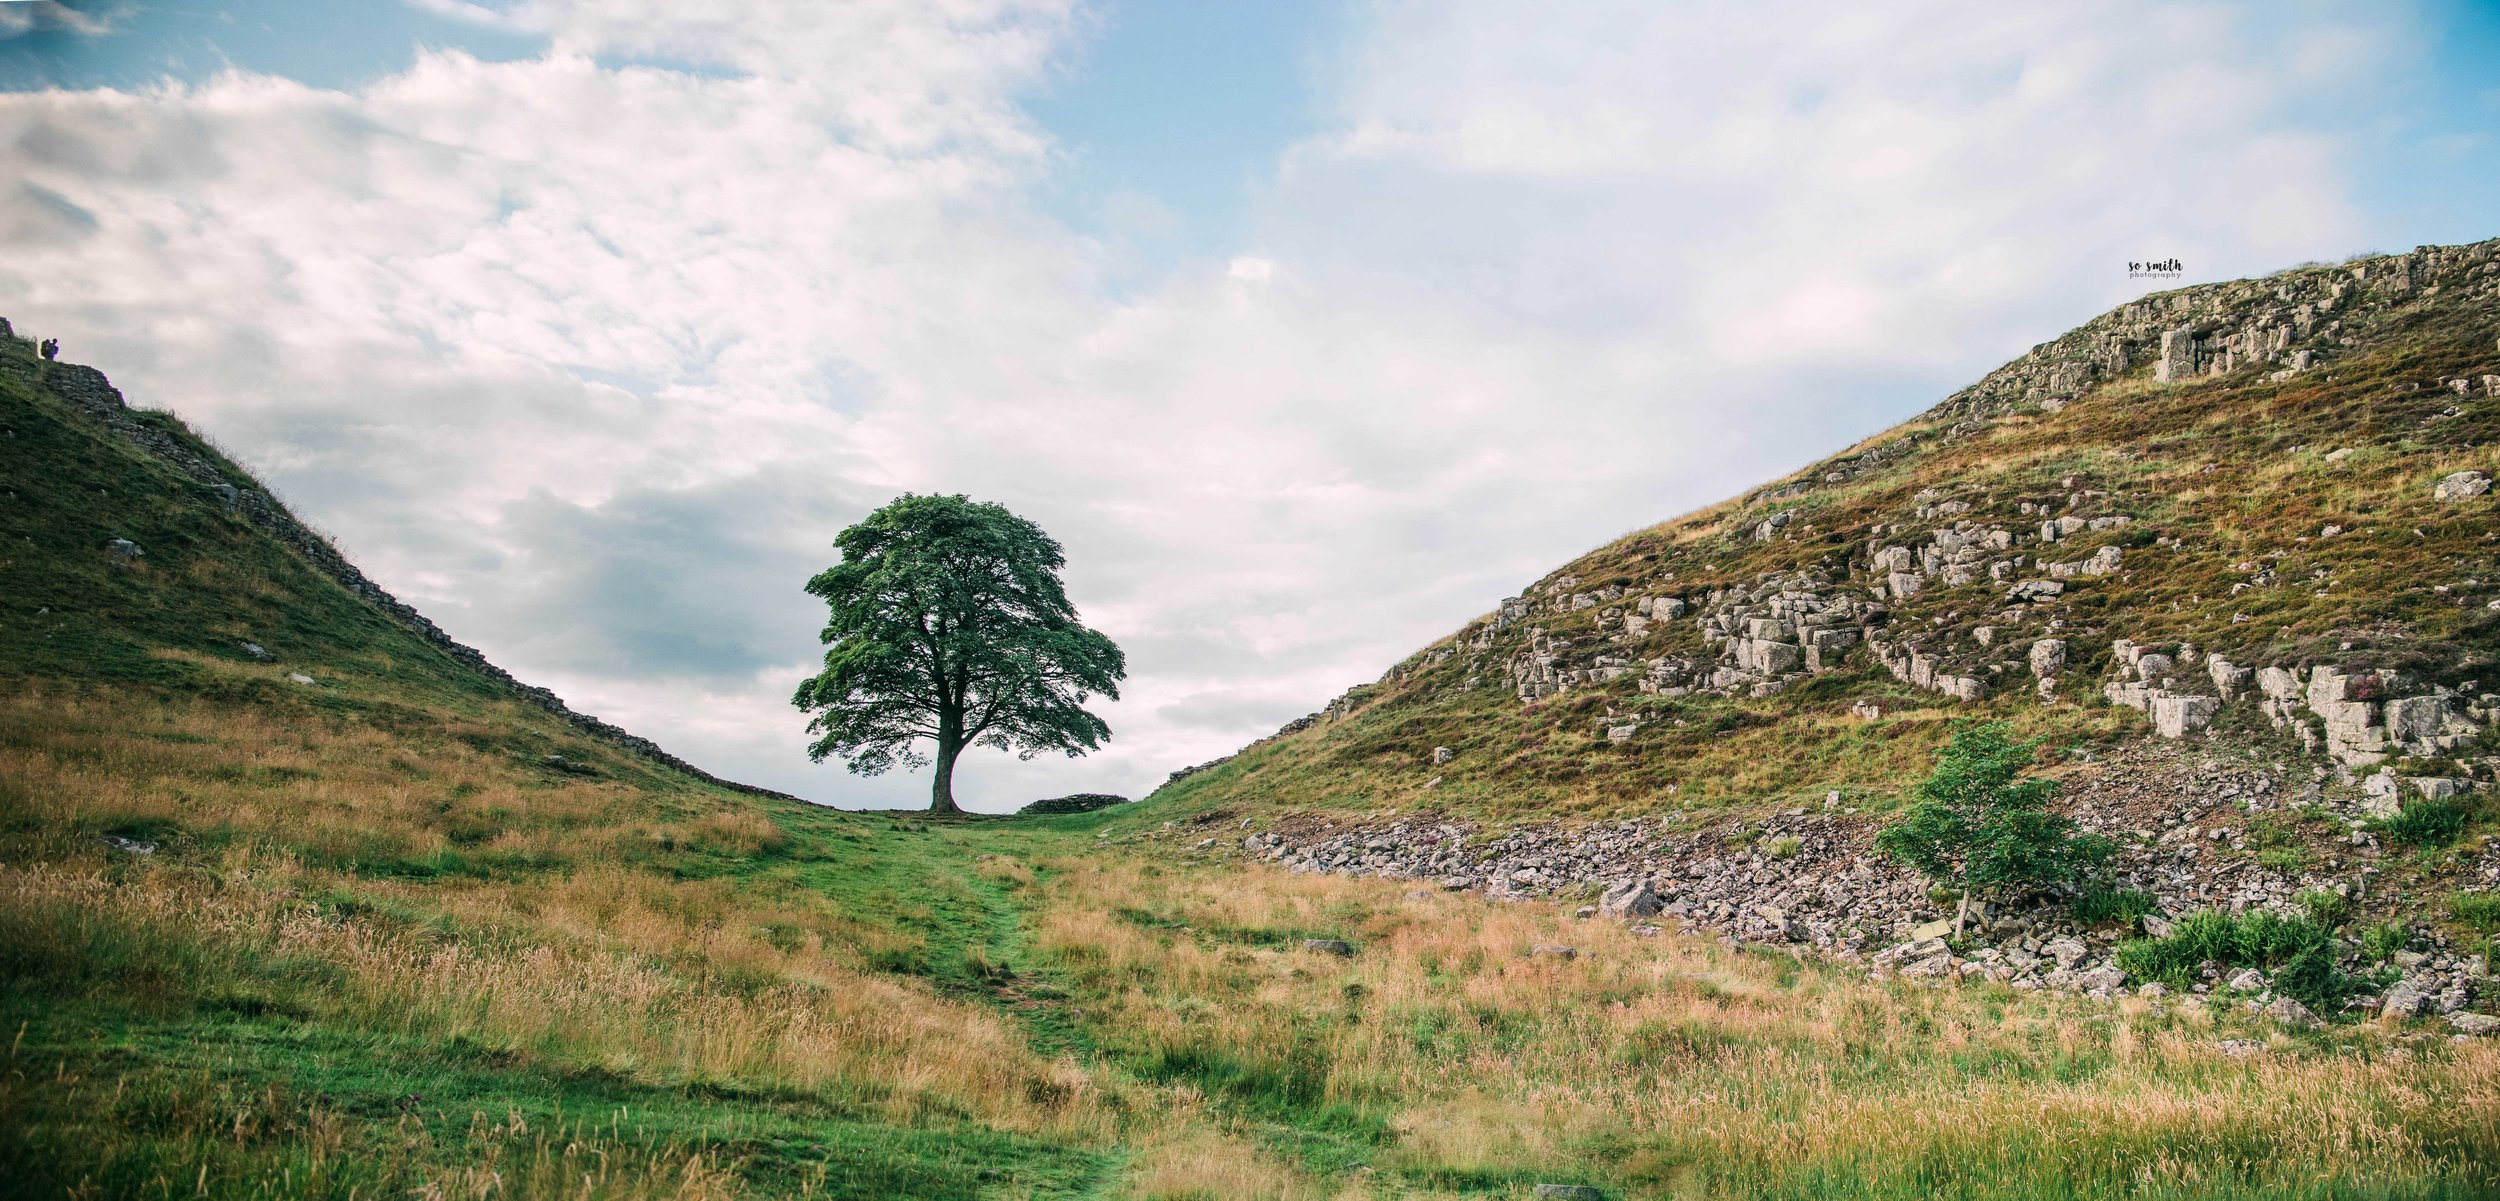 Sycamore Gap - Northumberland, UK